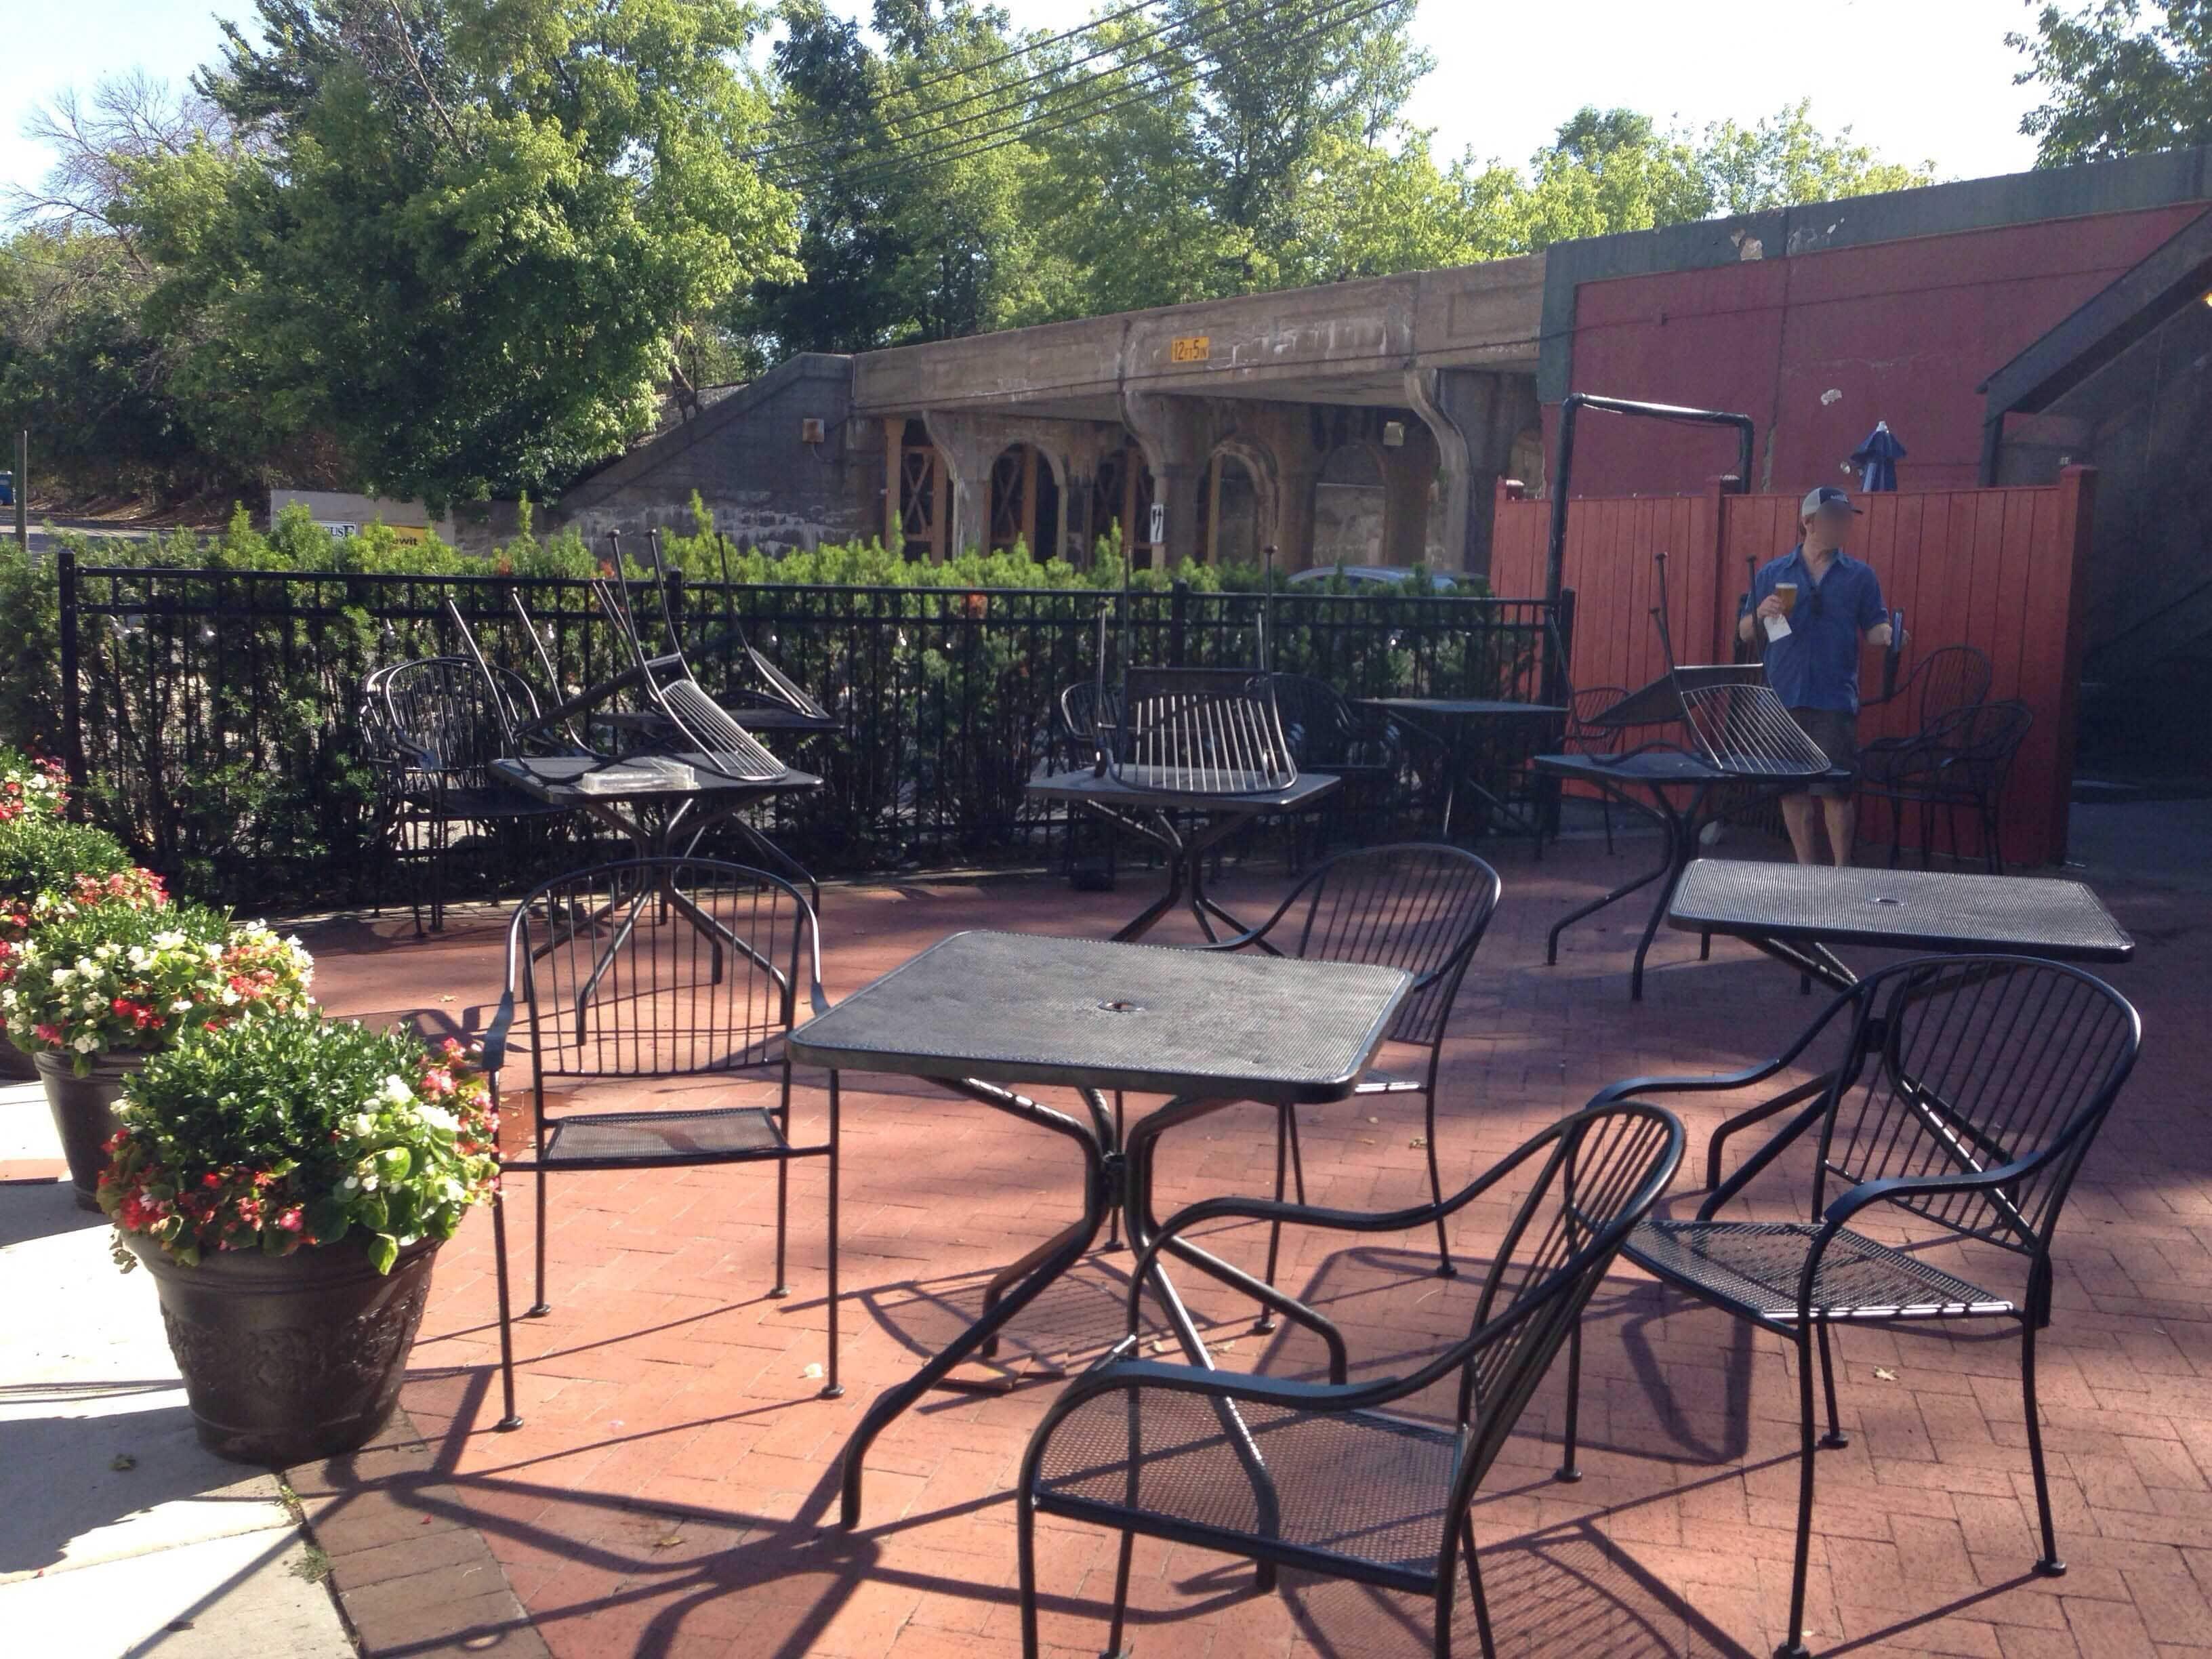 Backyard Grill Chicago Menu - Backyard Ideas